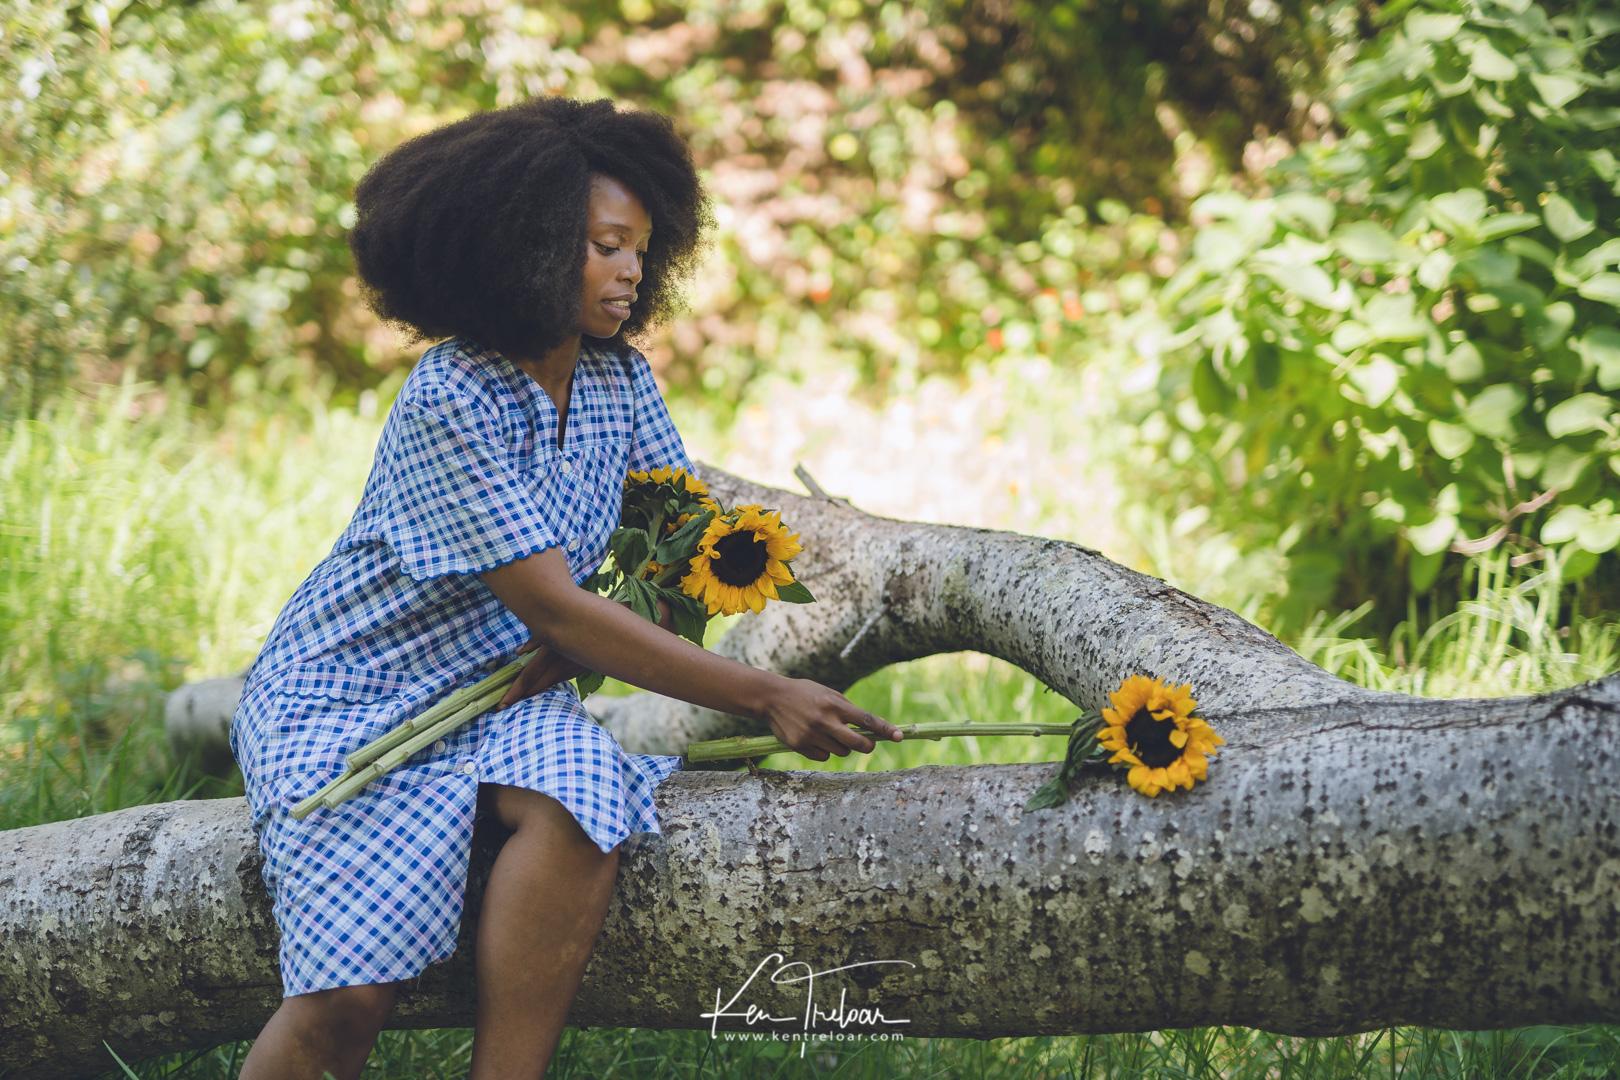 Ken Treloar Photography - Natural L-ight Editorial Portrait Fashion Photo Session - Cape Town Dec 2018-27.jpg